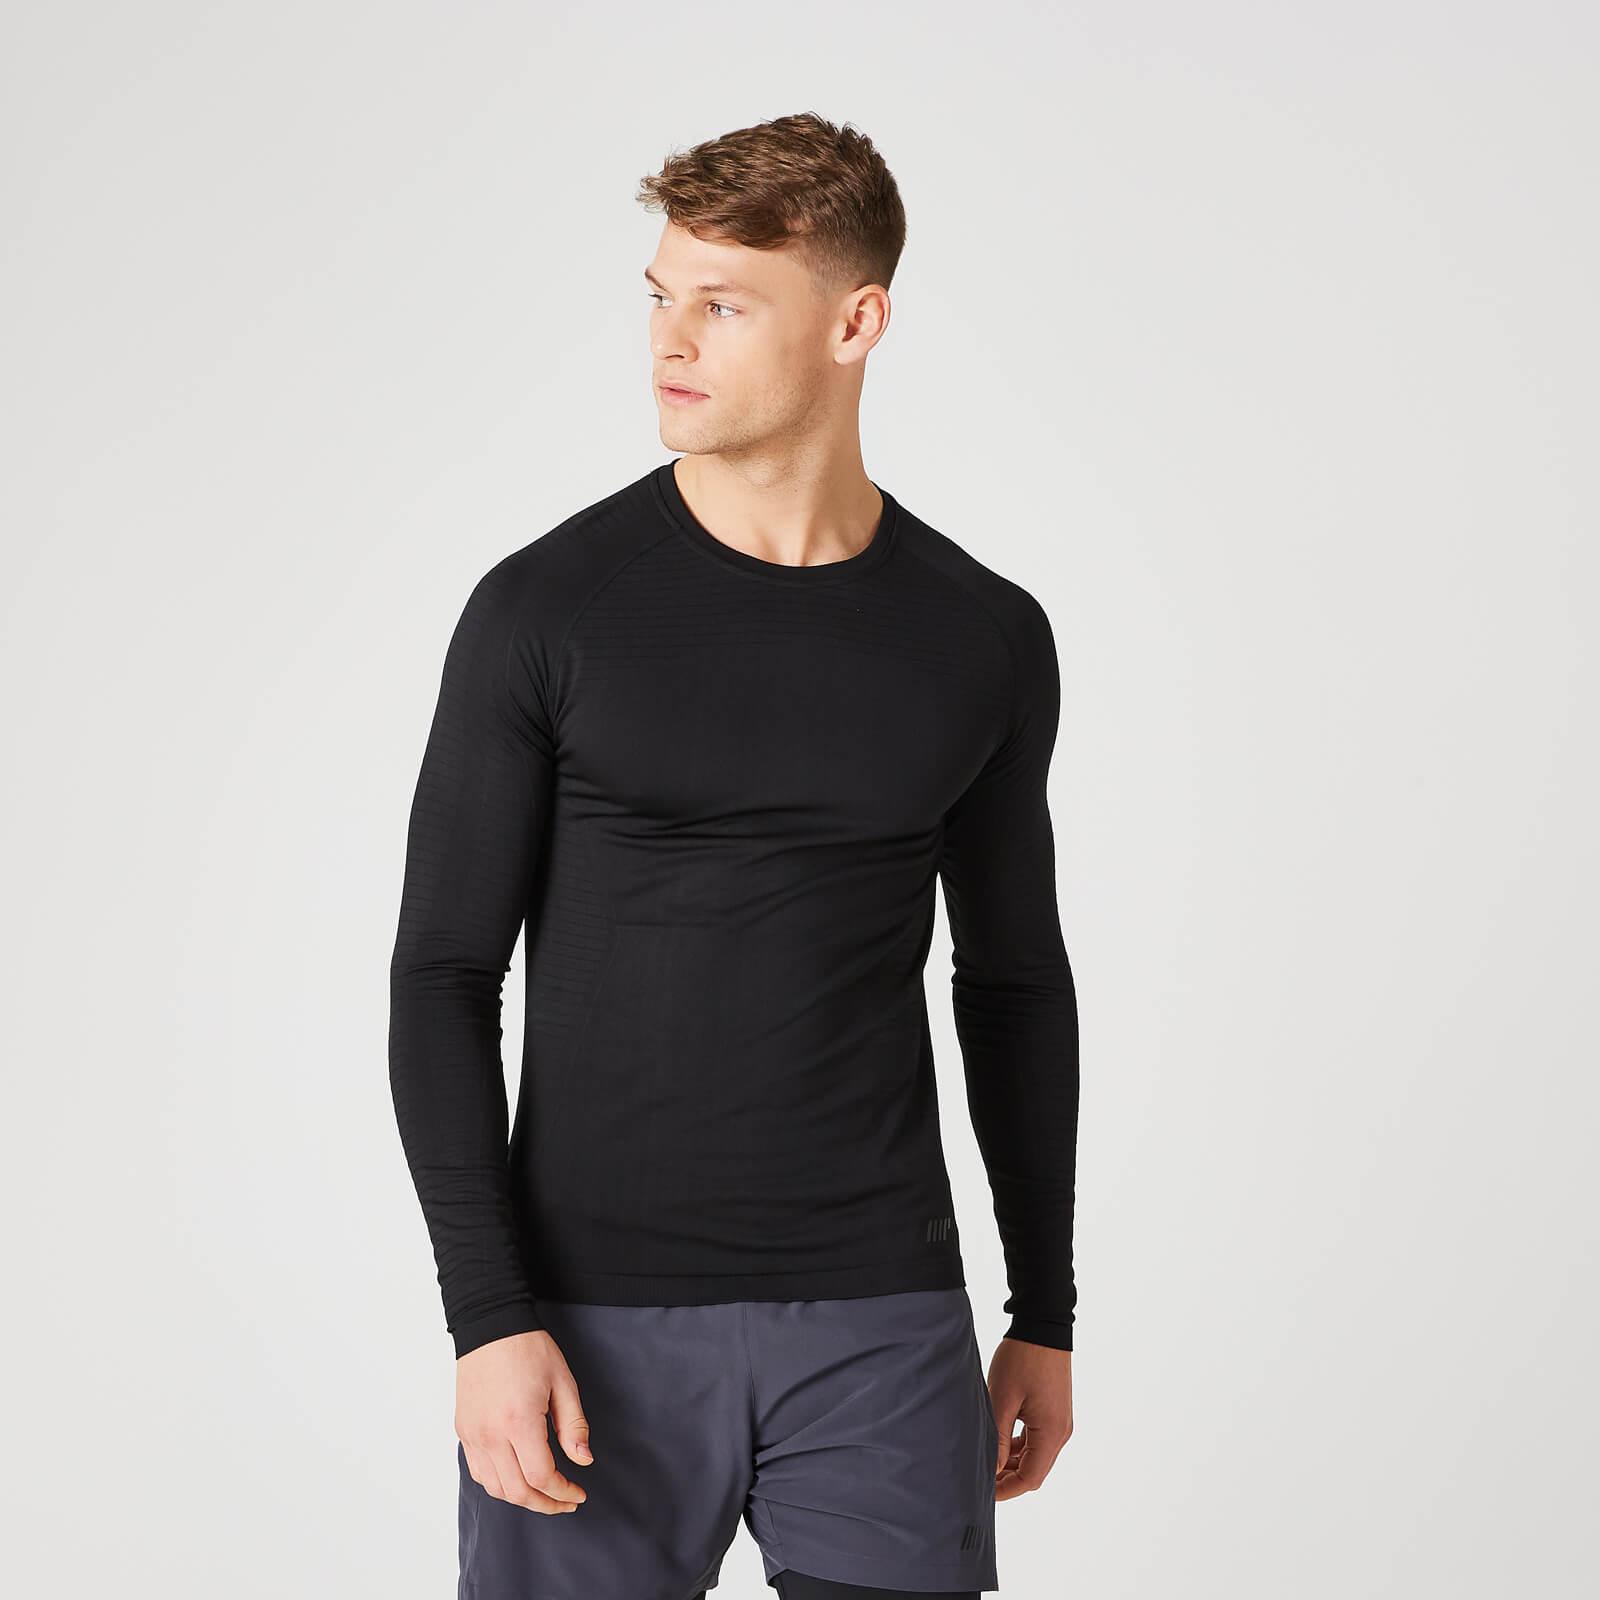 Myprotein Elite Seamless Long-Sleeve T-Shirt – Black - M - Black